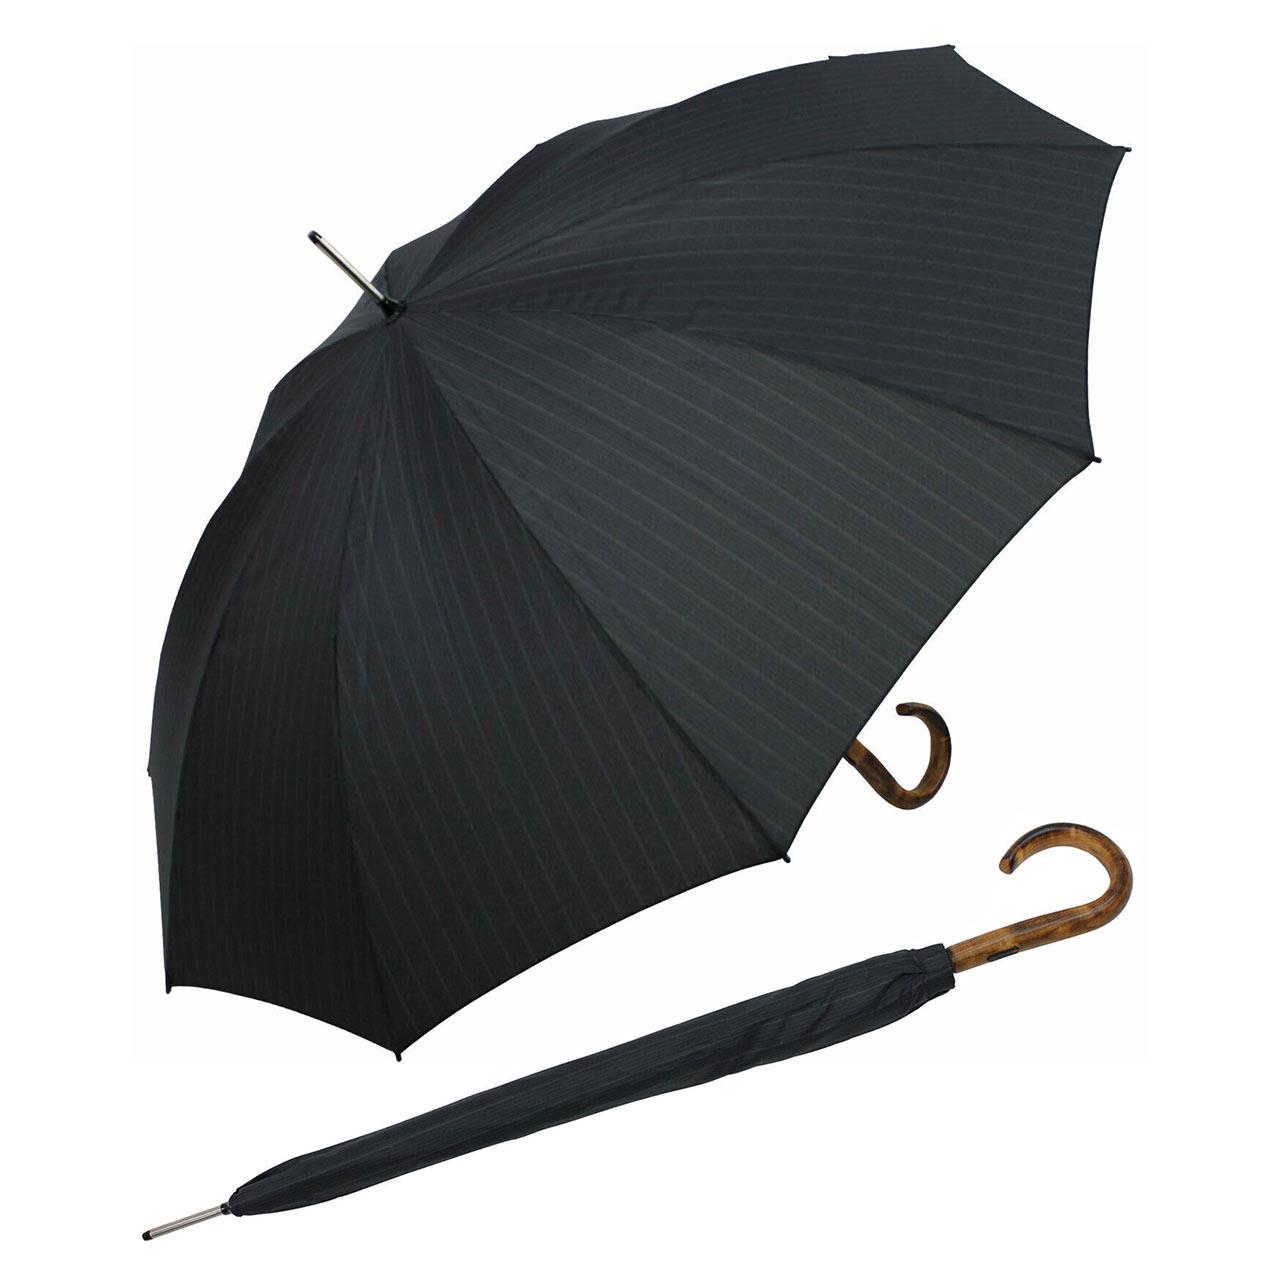 KNIRPS stick umbrella SL 923 Stripes   the design gift shop